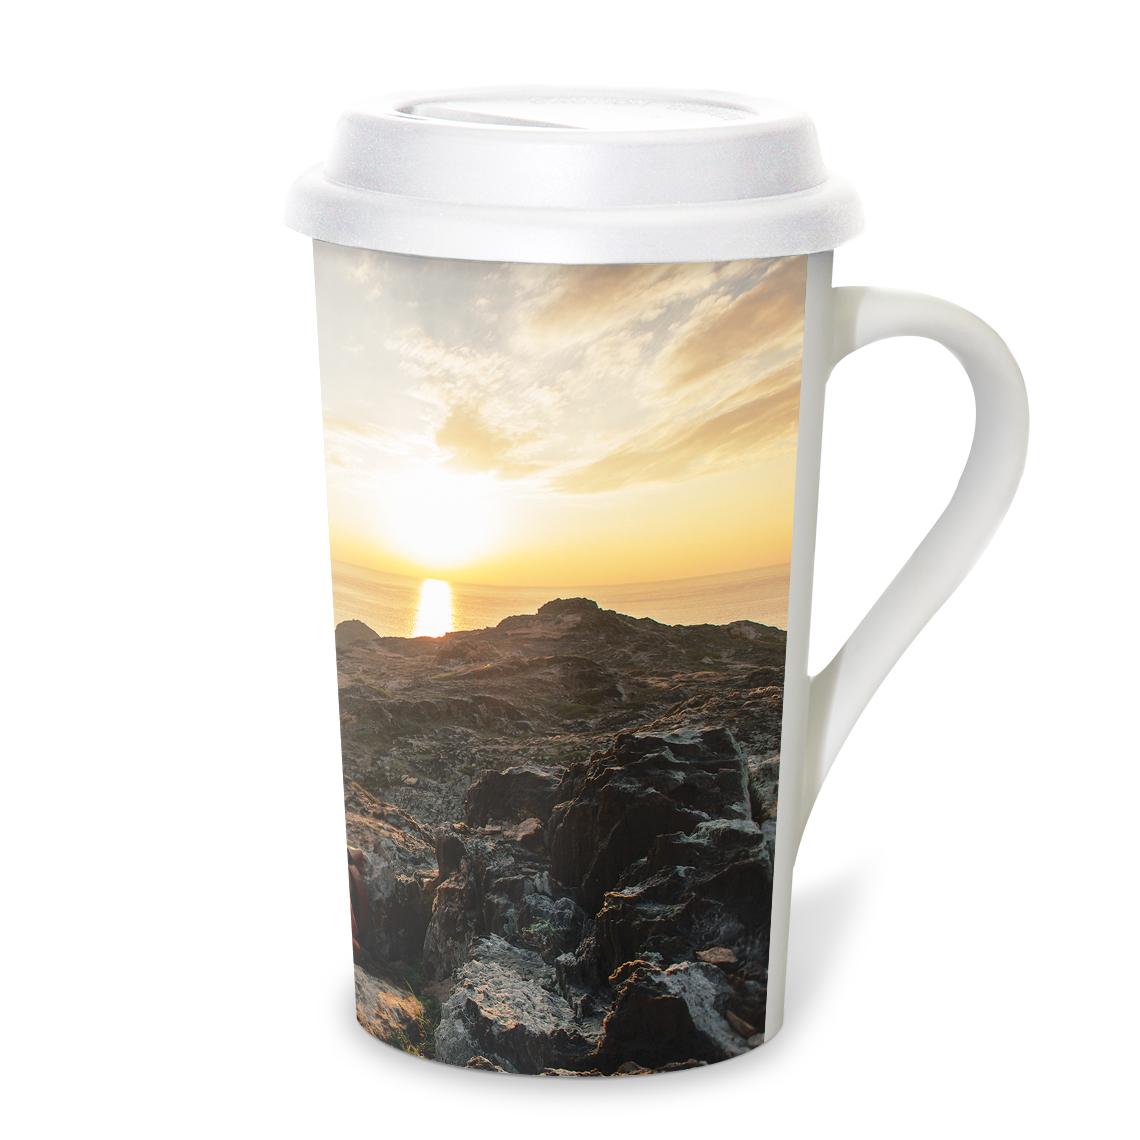 Grande Coffee Mug With Lid 16oz